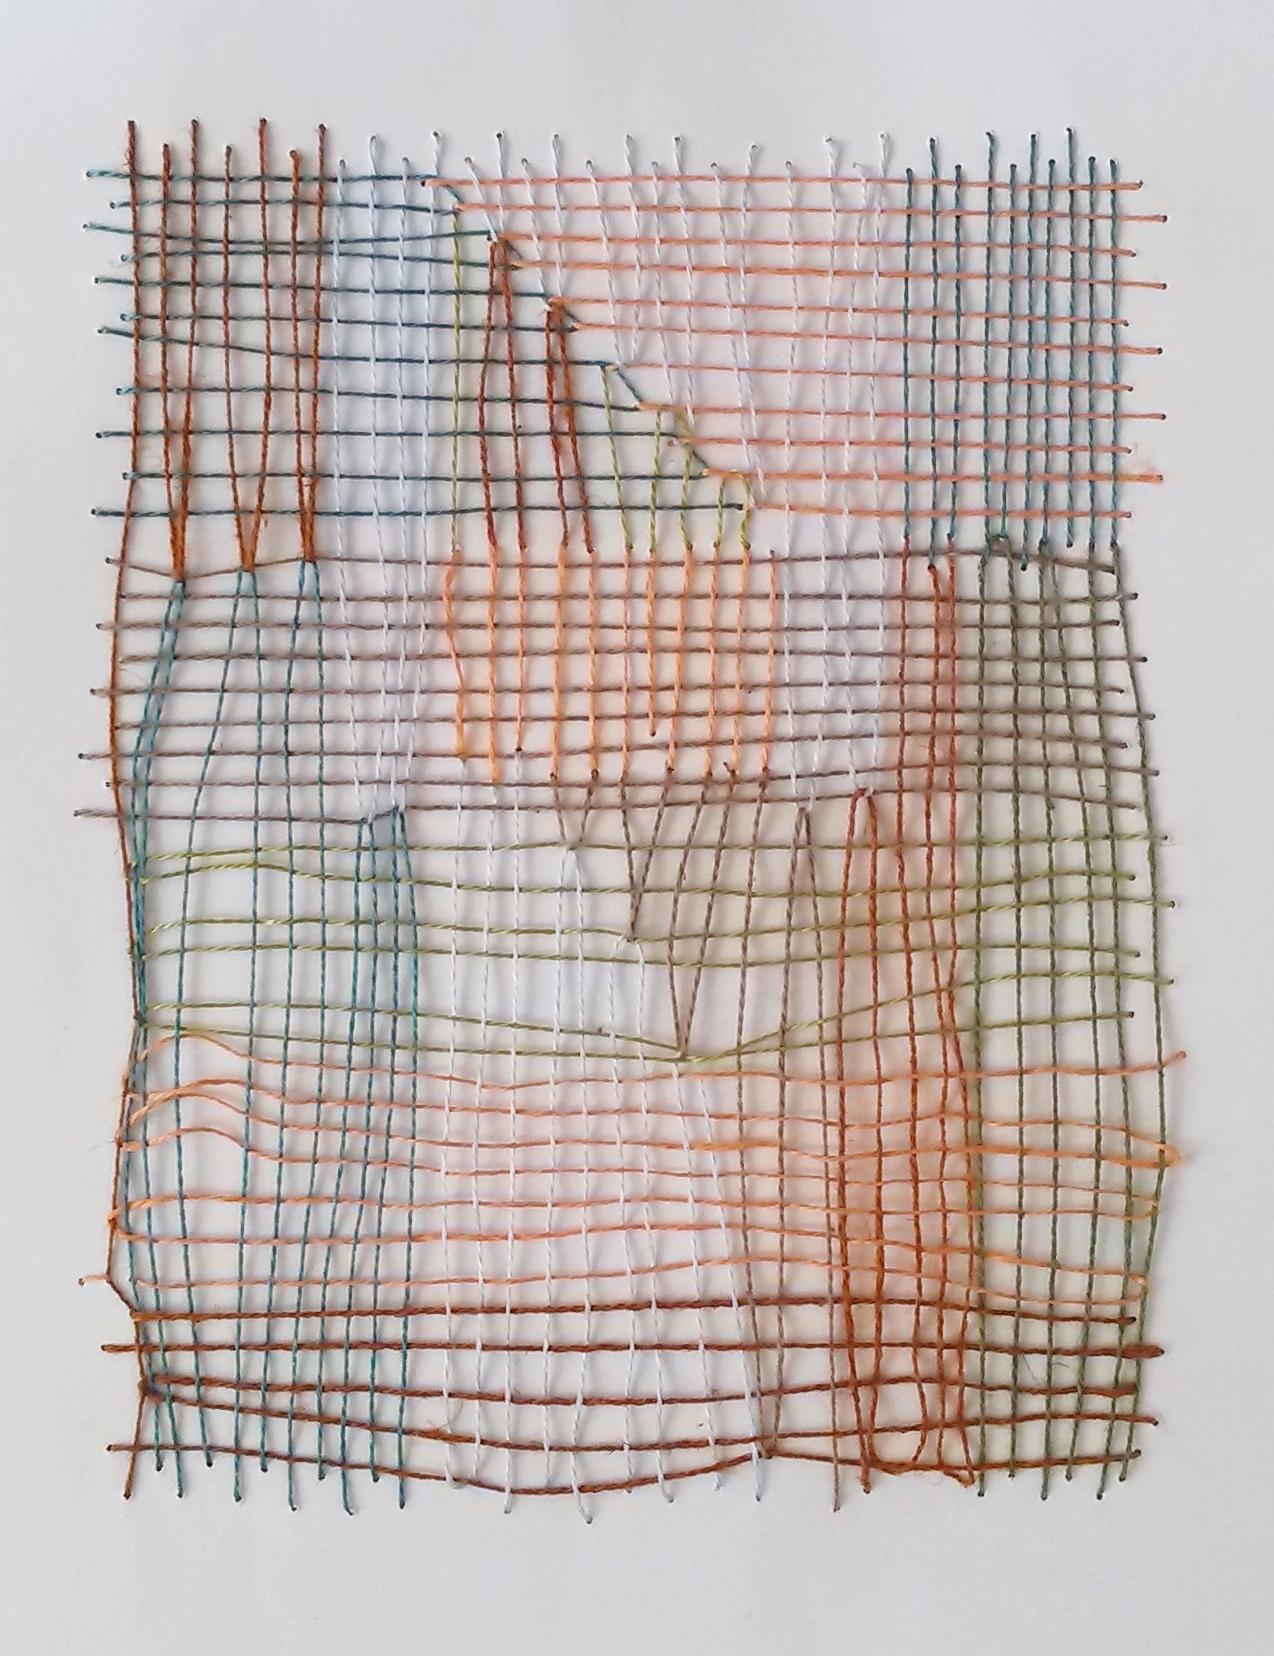 Mixed fibers on paper, 2015